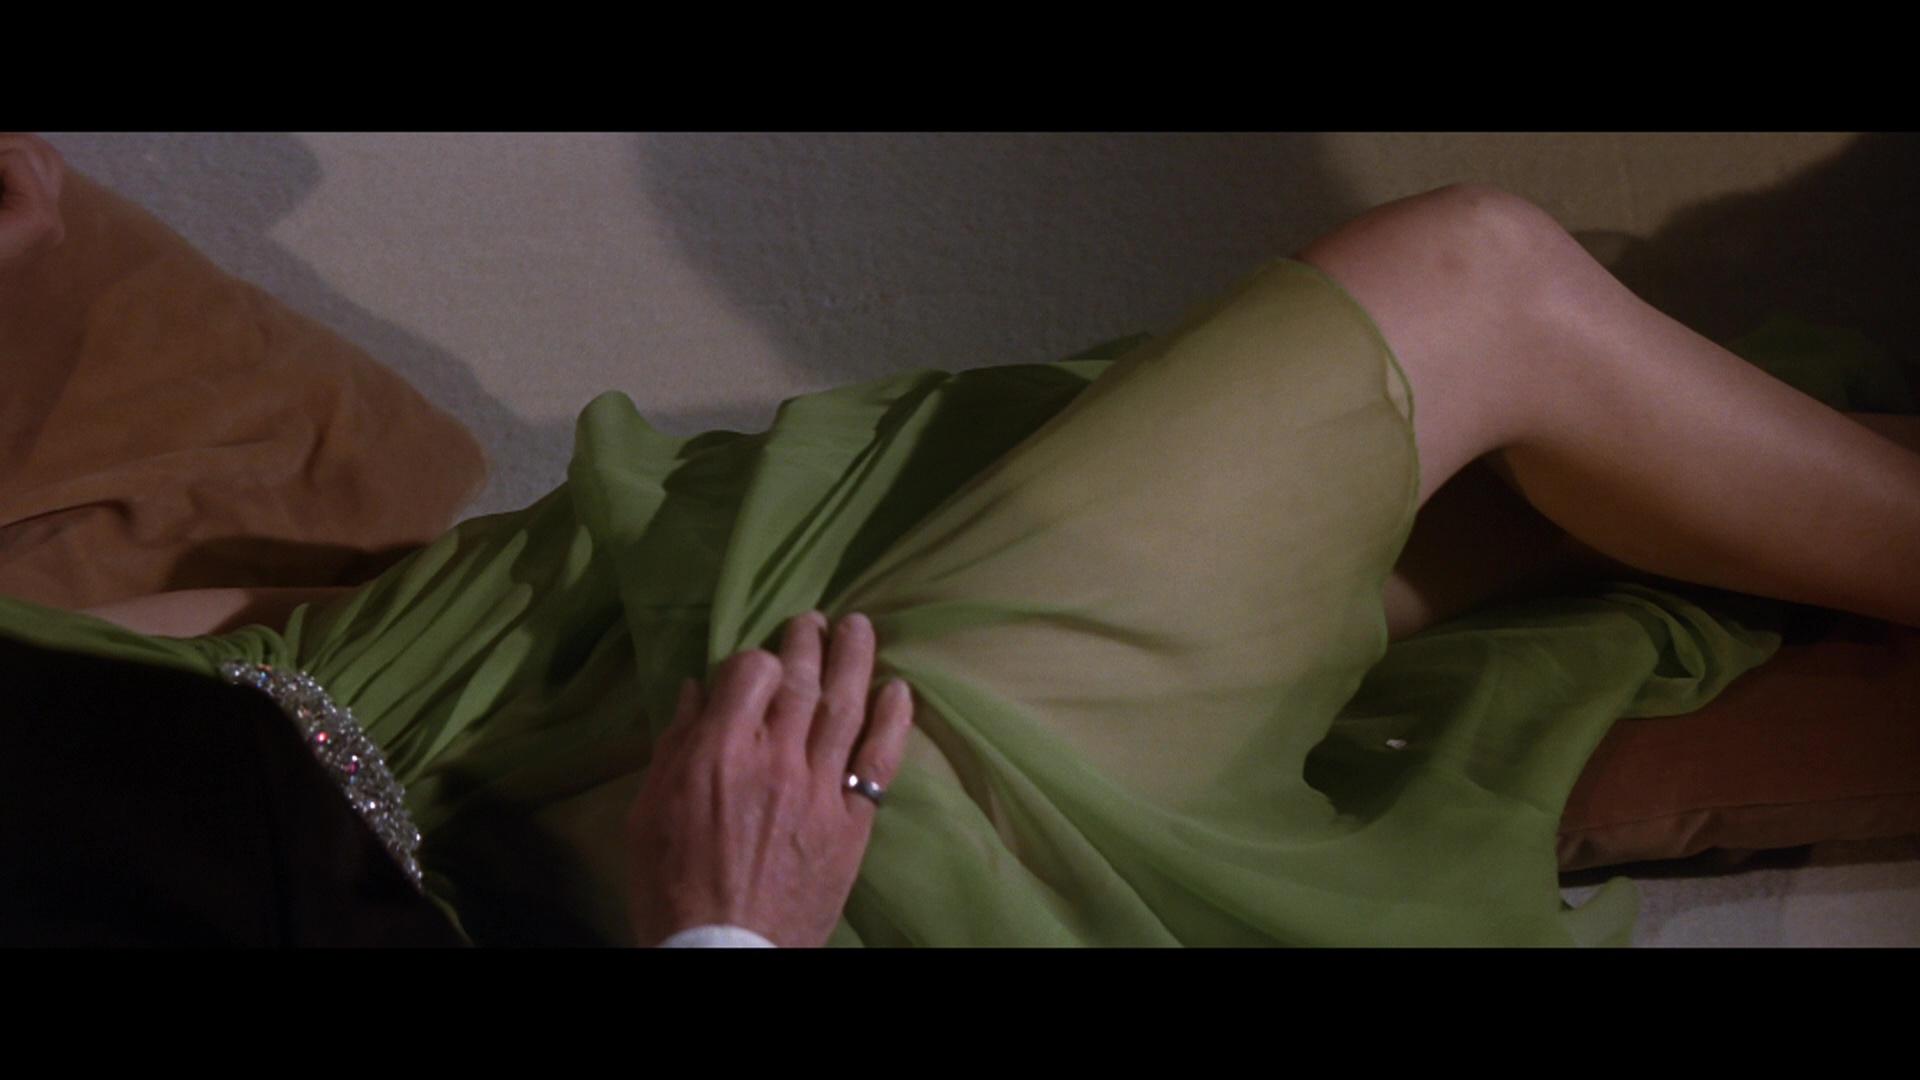 Jess franco mondo erotico 2k render - 2 2